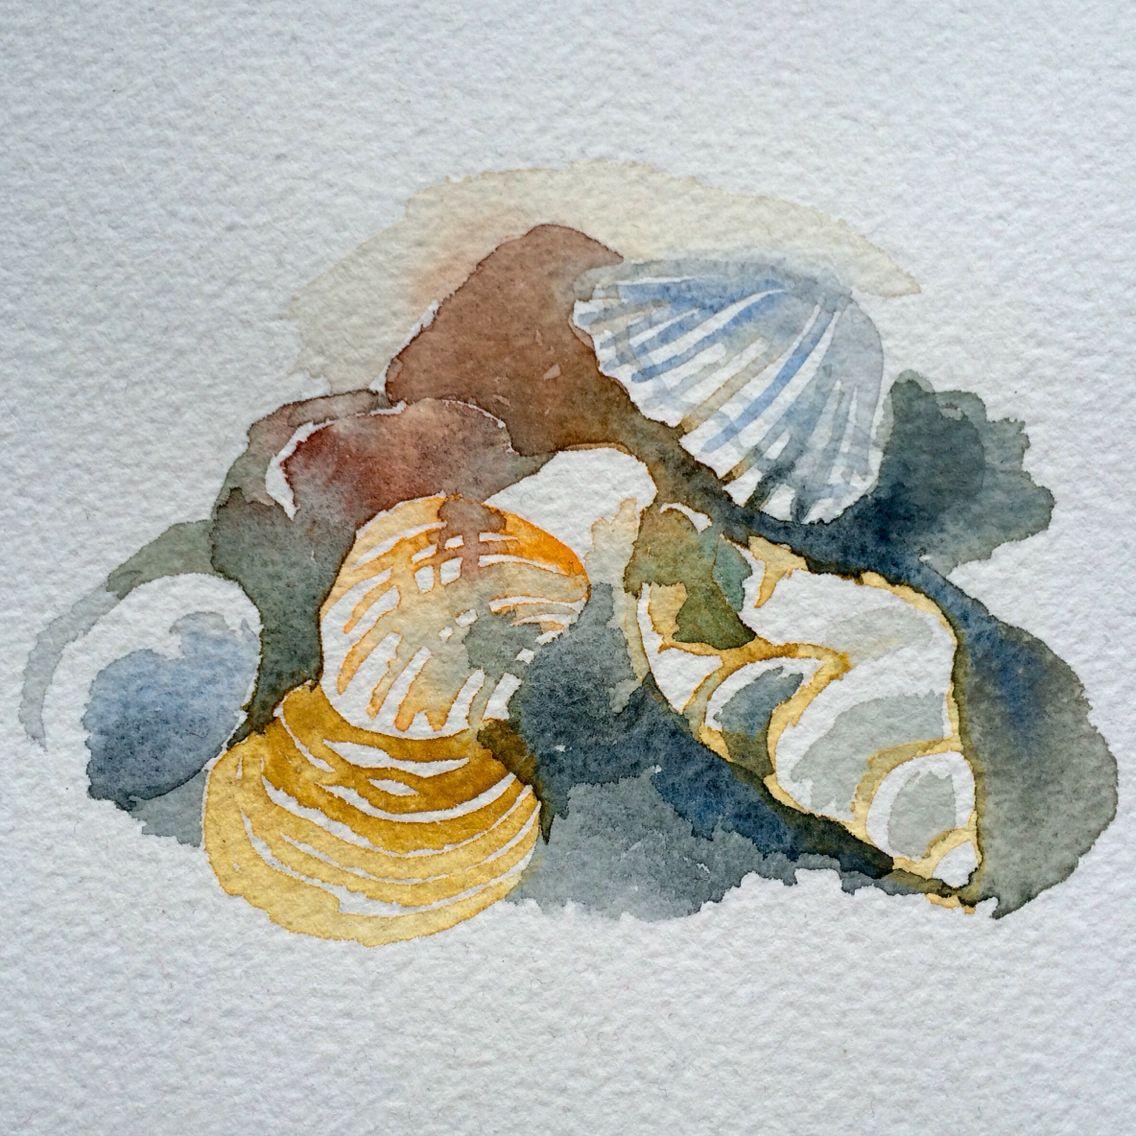 Sea shells - watercolour by Marie Åhfeldt, Mås Illustra